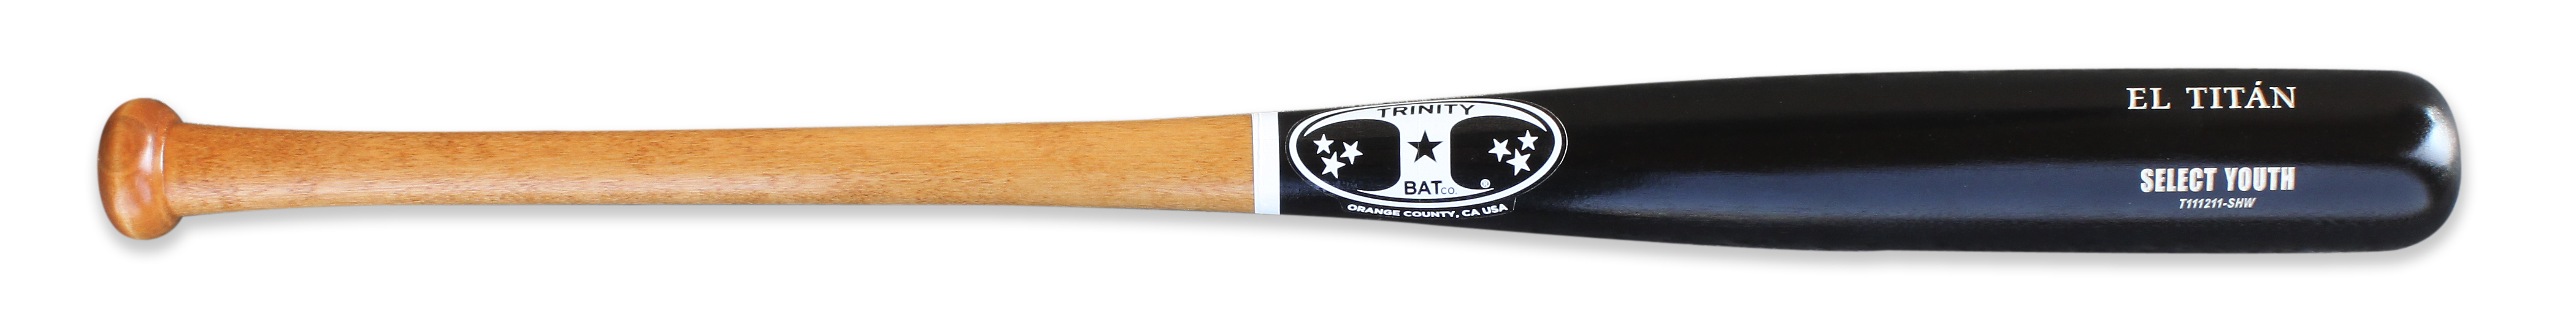 el-titan-bat.jpg